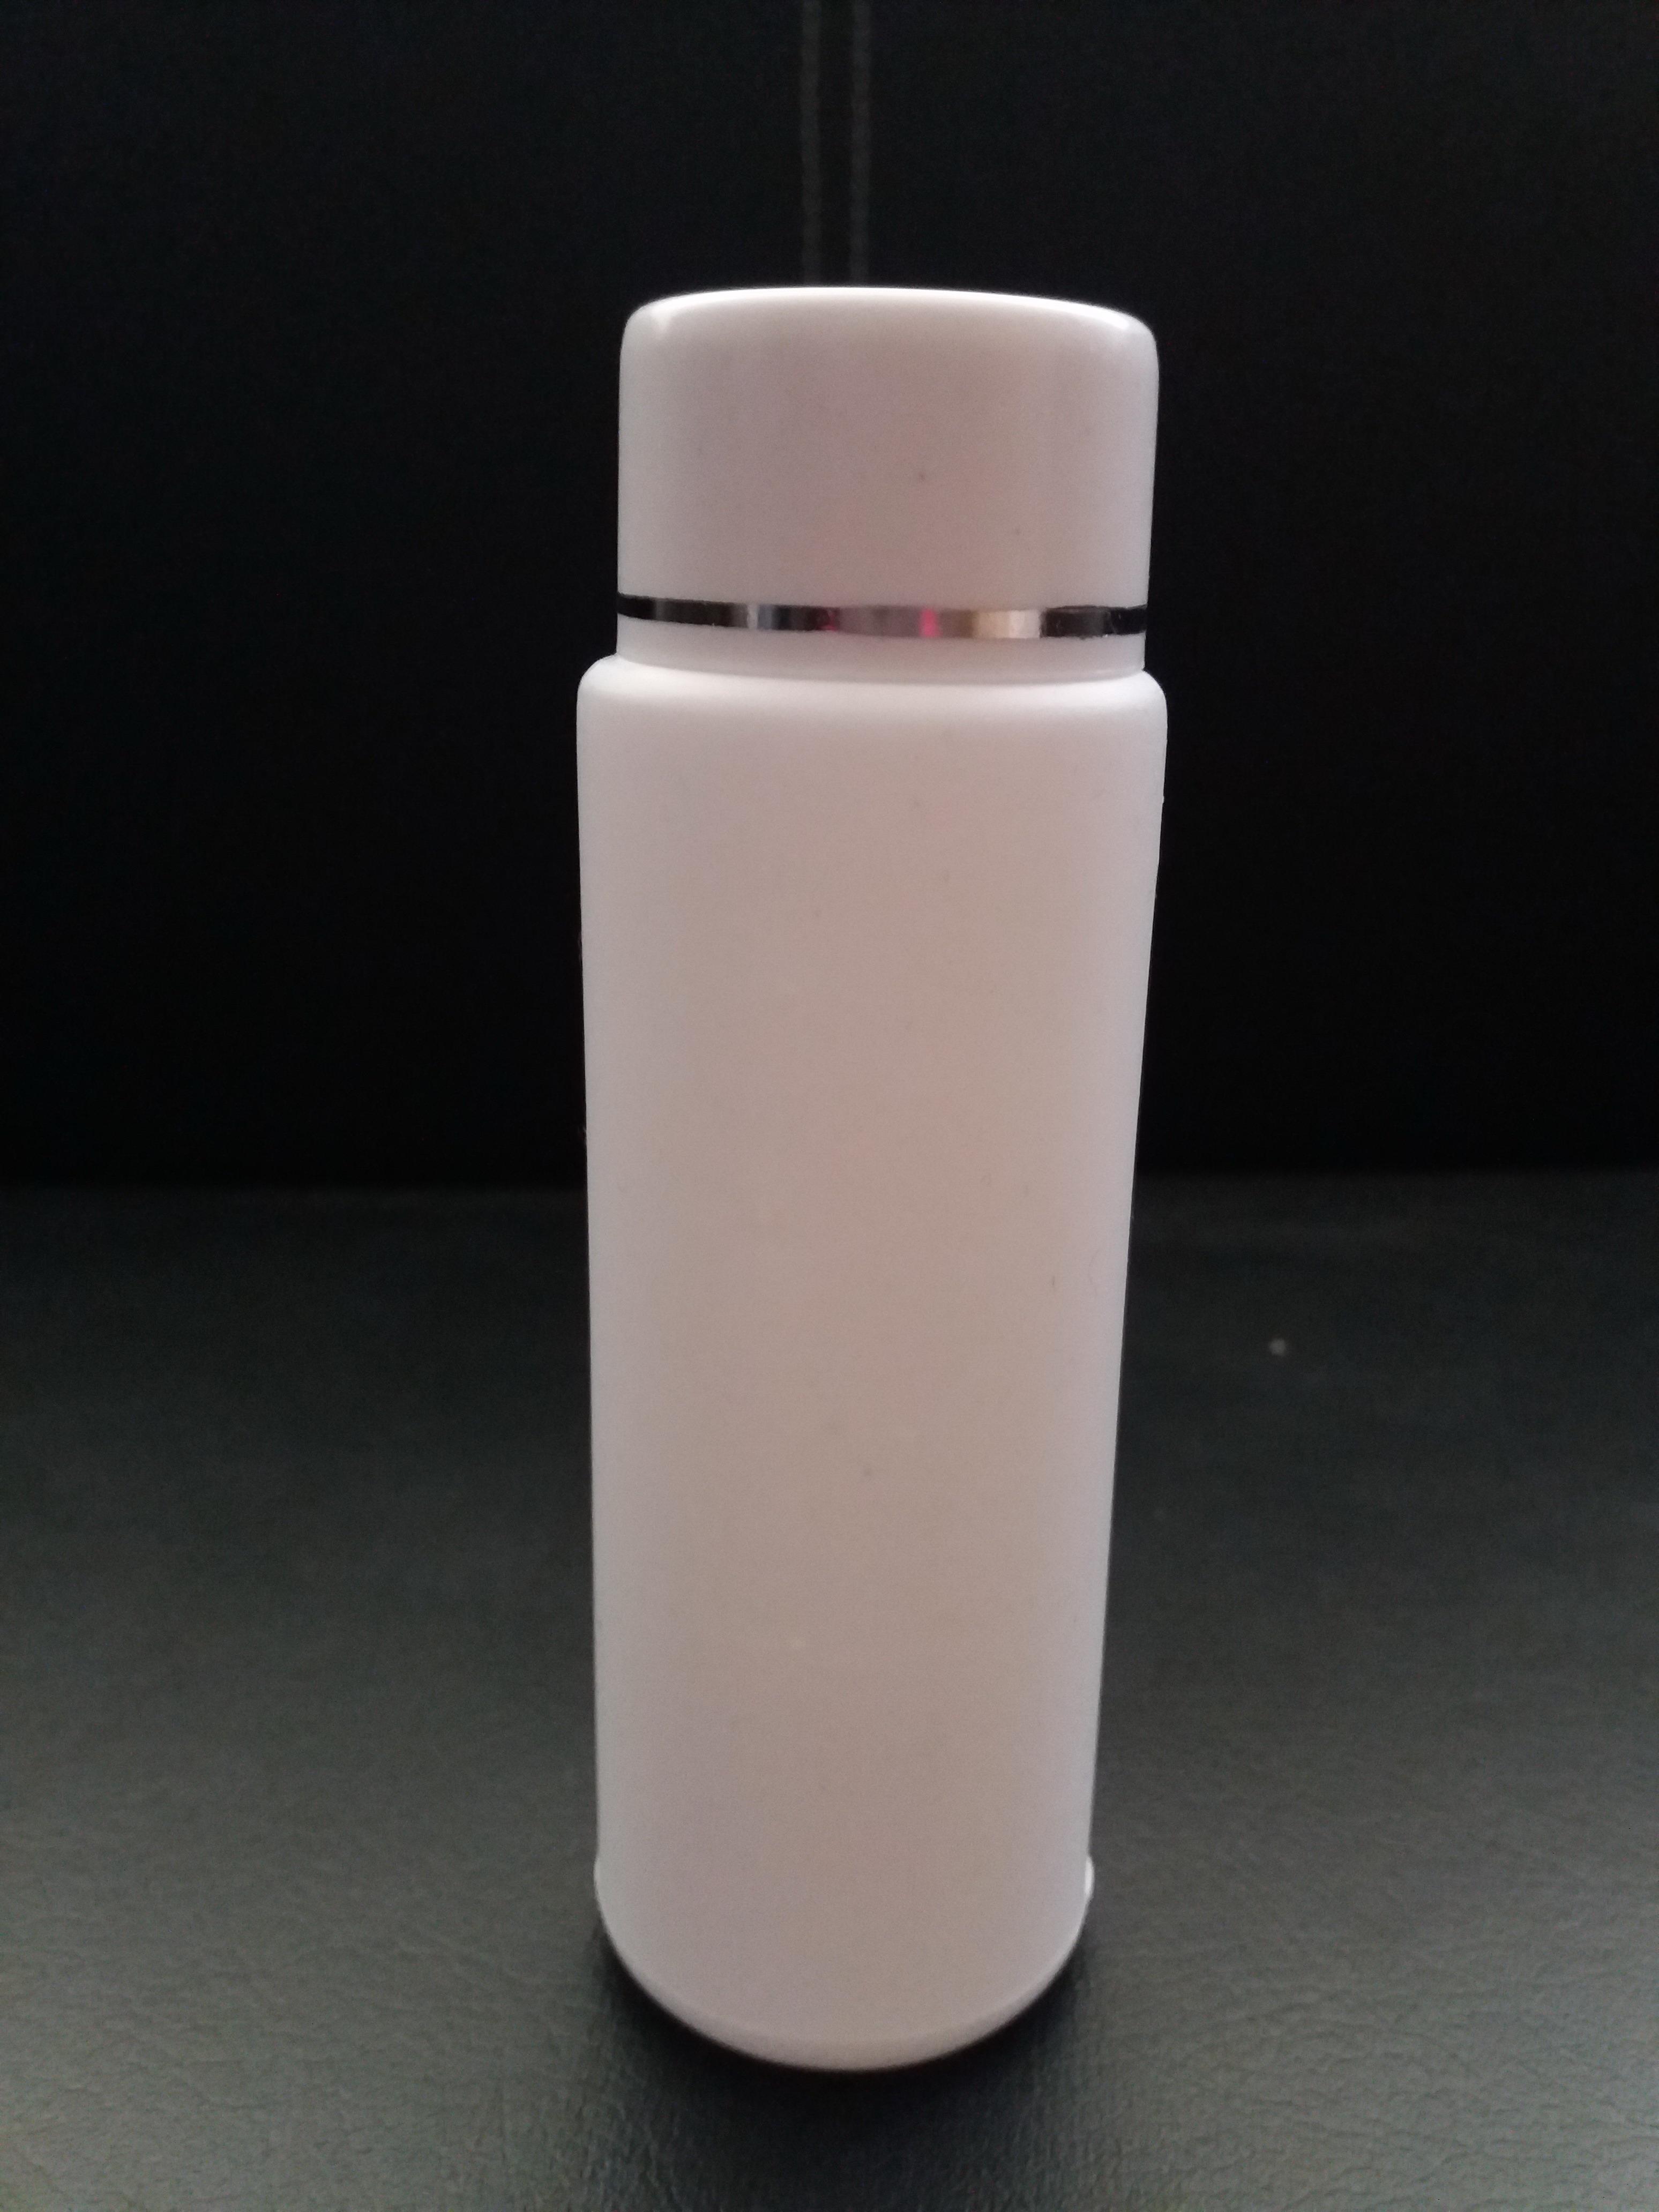 Jual Botol Plastik Yl 100 Ml Harga Murah Surabaya Oleh PT